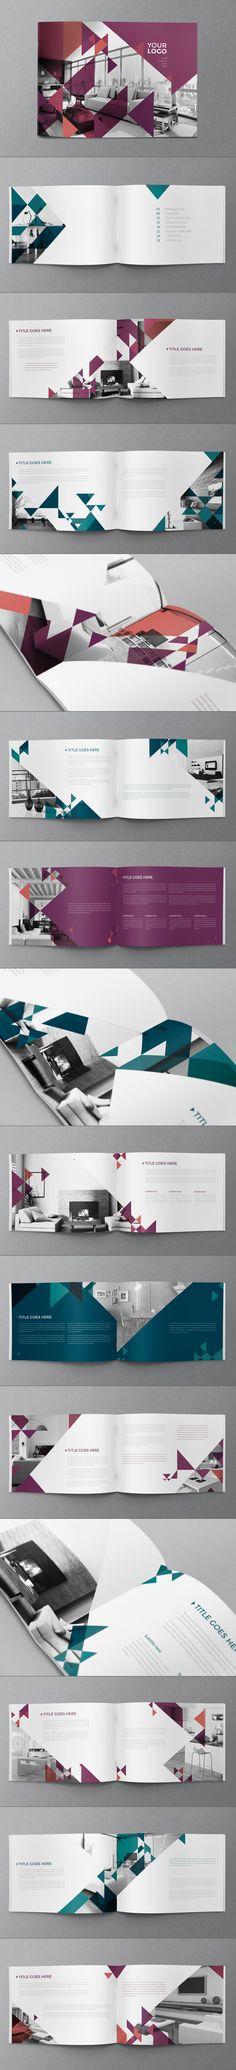 Modern Red Blue Brochure. Download here: http://graphicriver.net/item/modern-red-blue-brochure/8113627?ref=abradesign #design #brochure